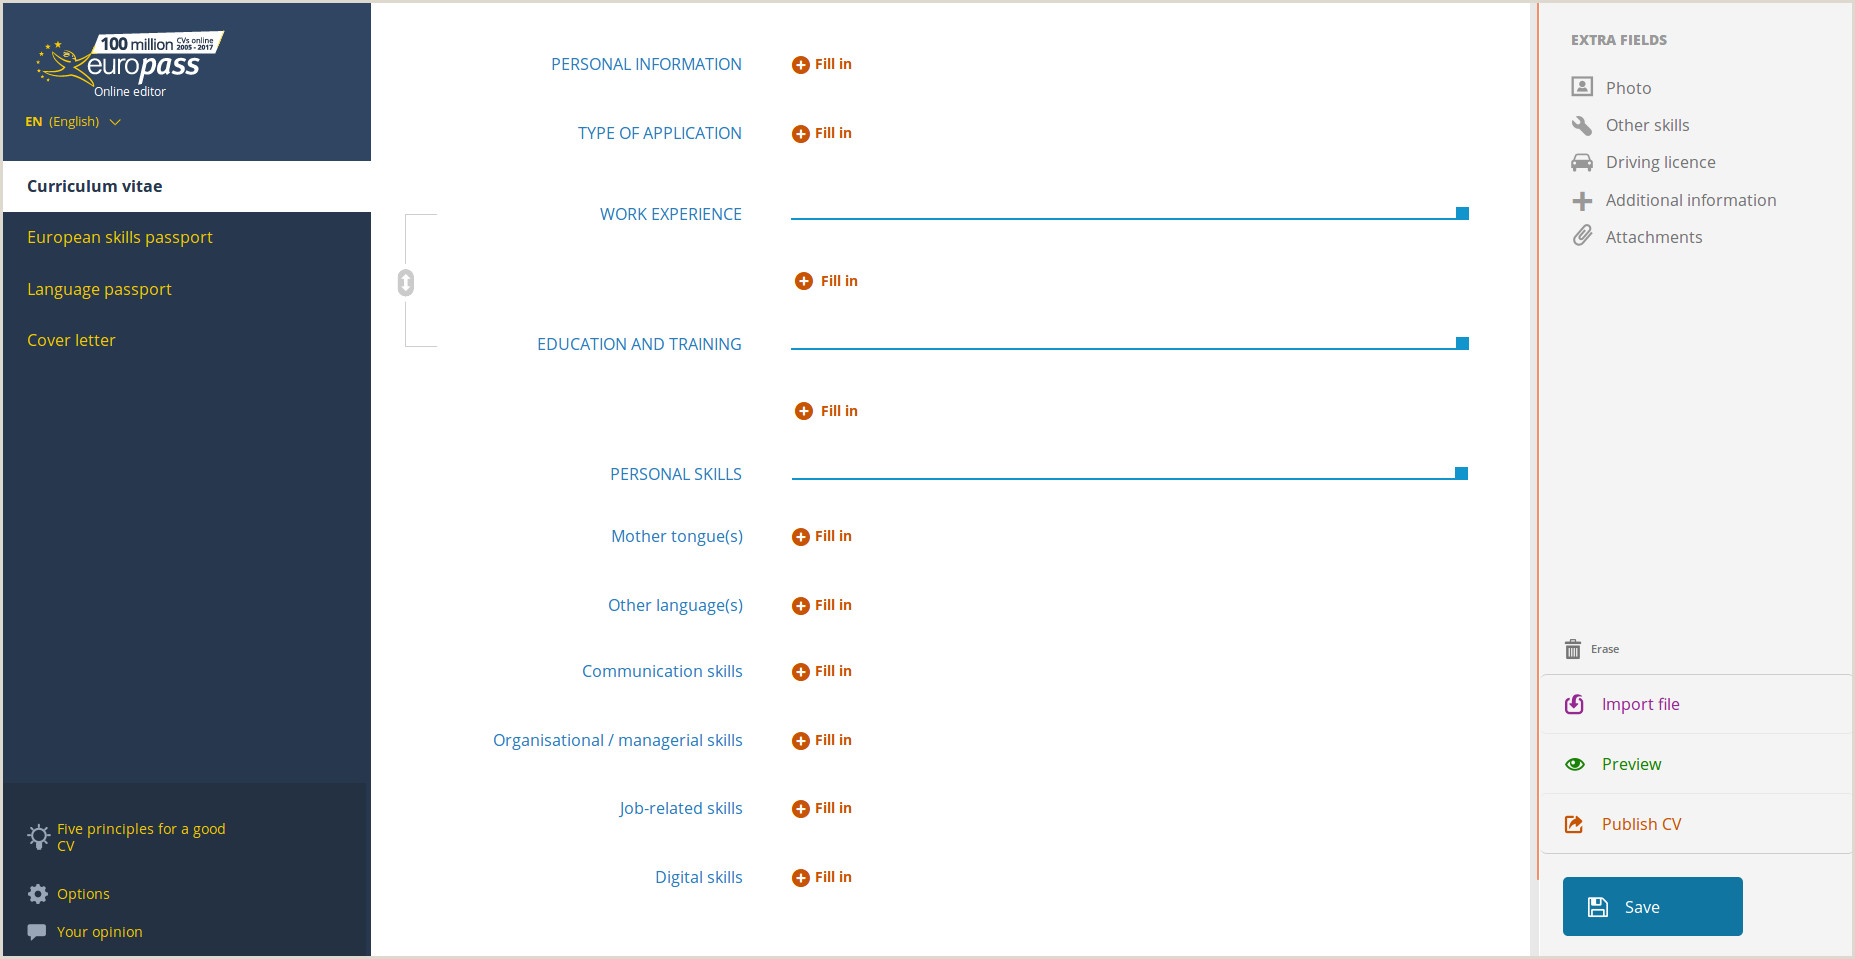 Cv Europass format In Romana Applicazione Online Curriculum Vitae